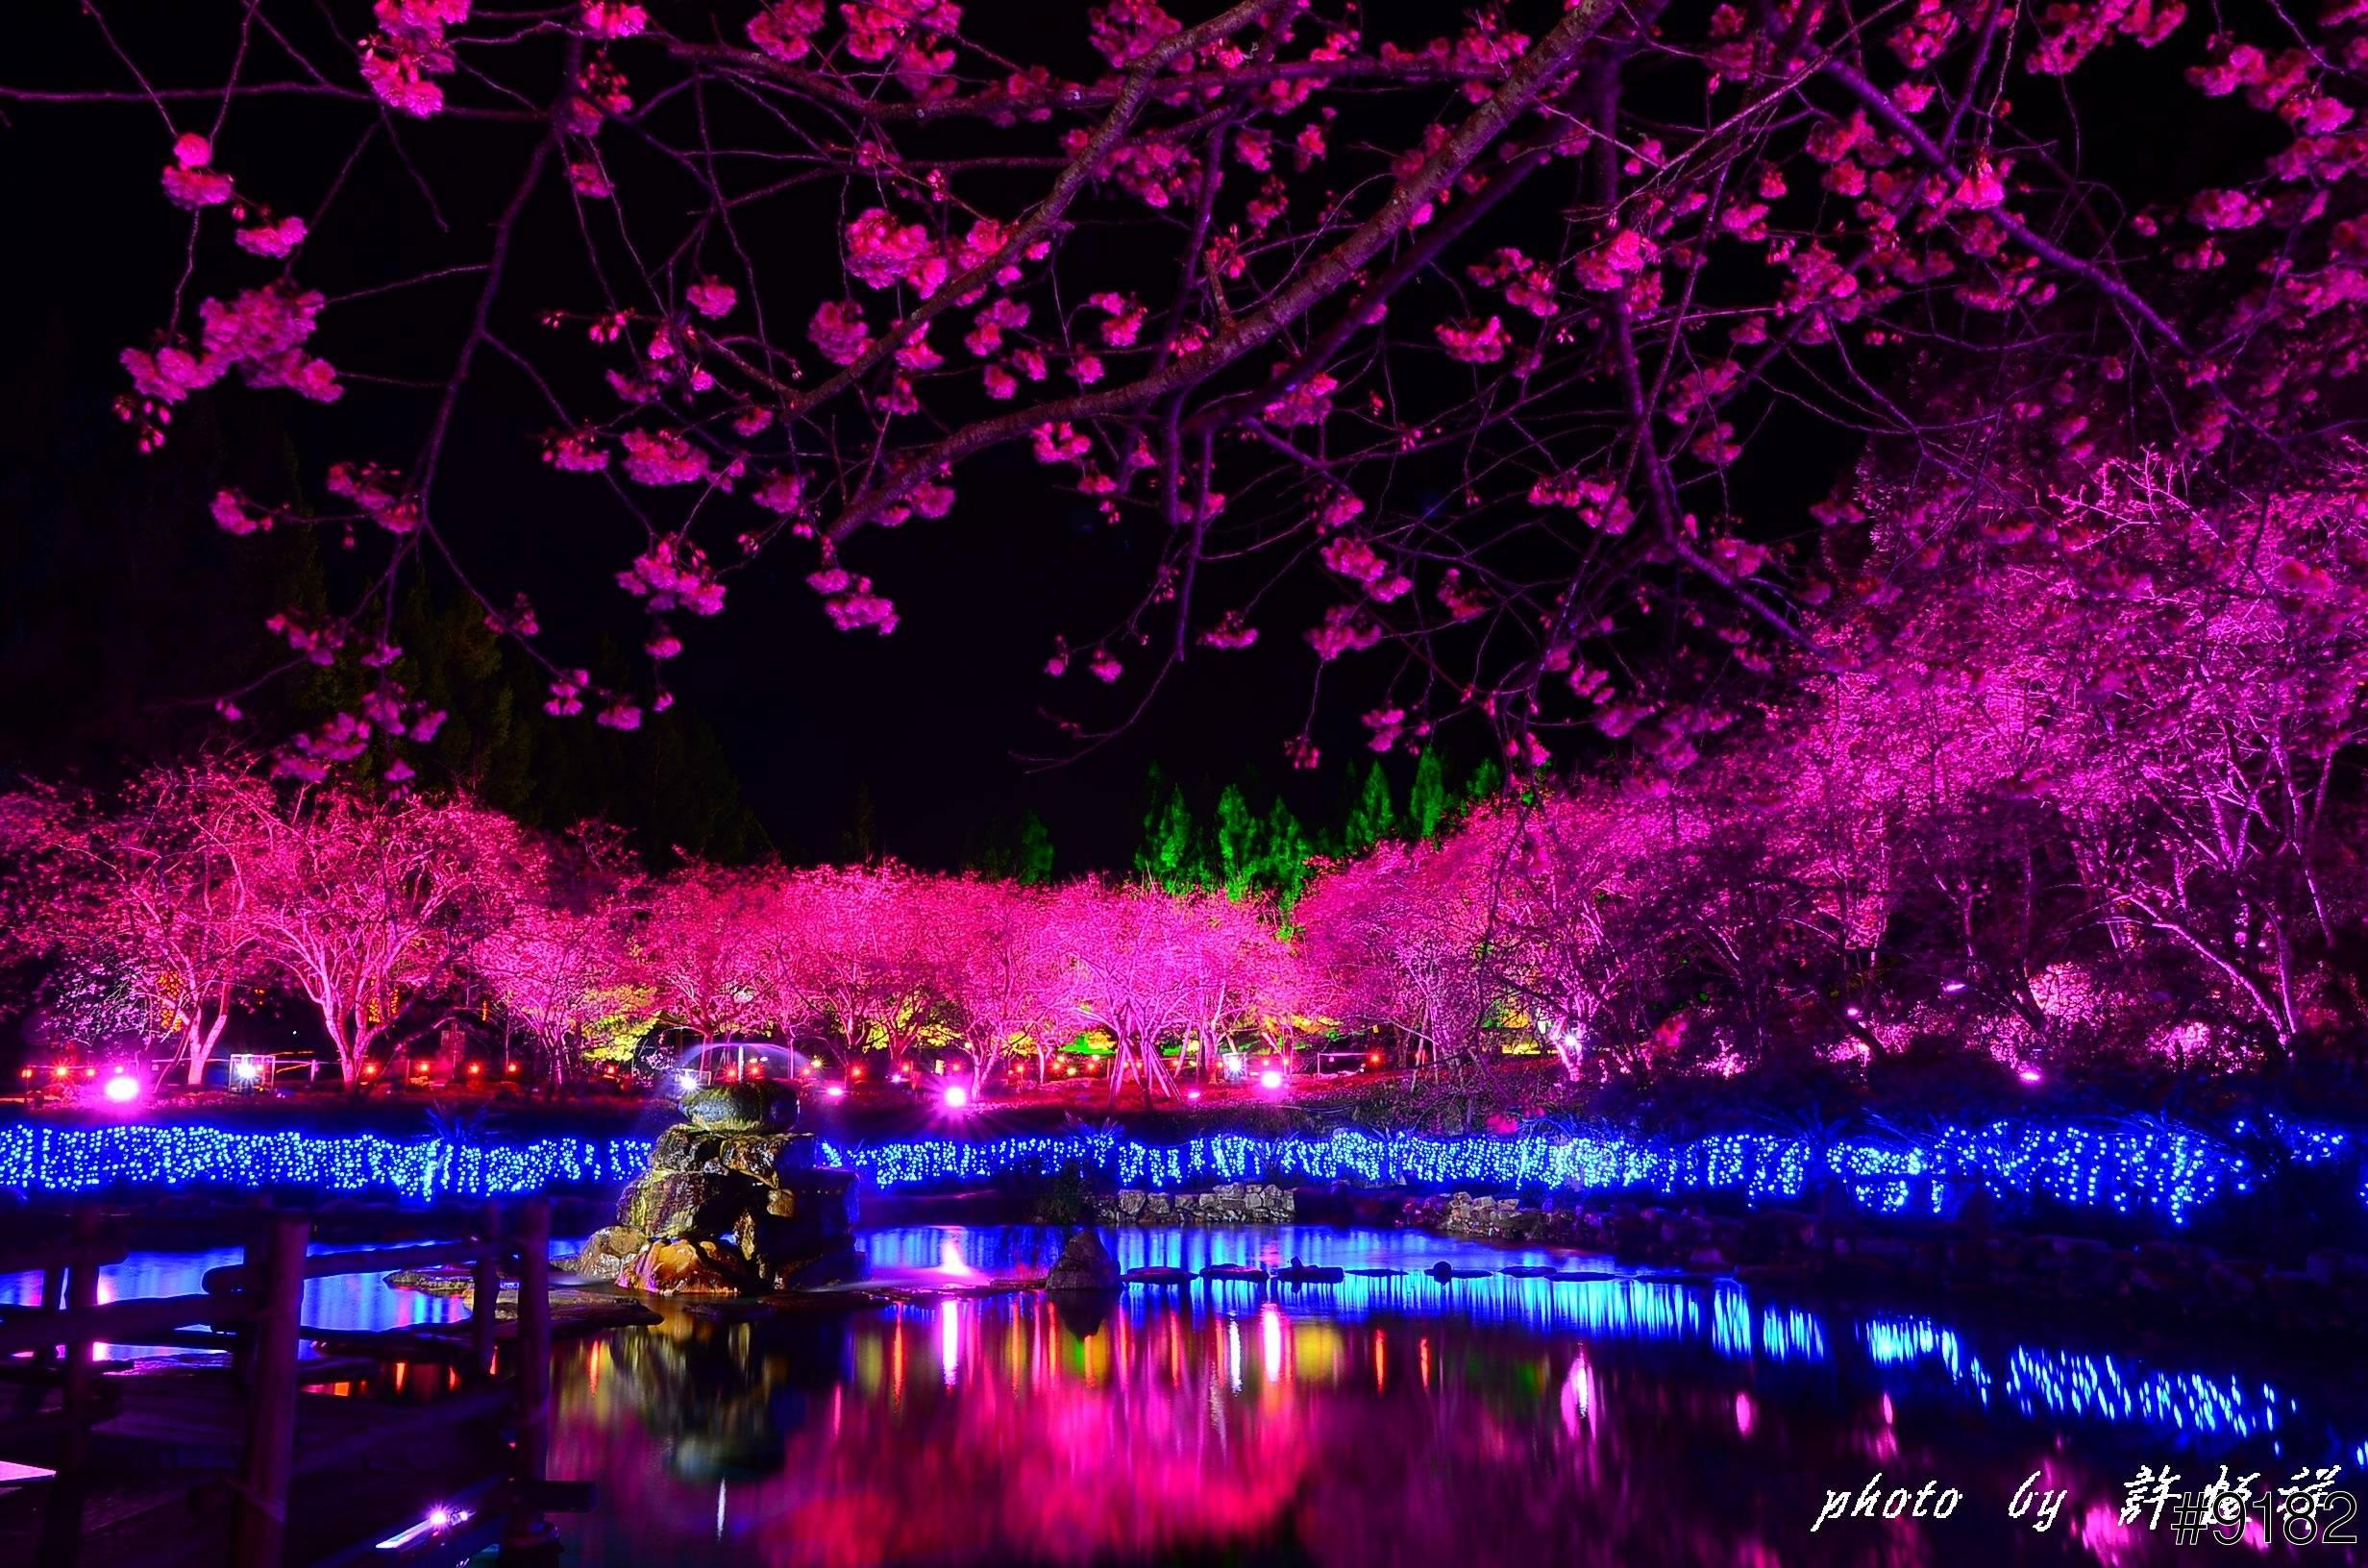 بالصور صور من اليابان , موسم تفتح ازهار الكرز 3390 10